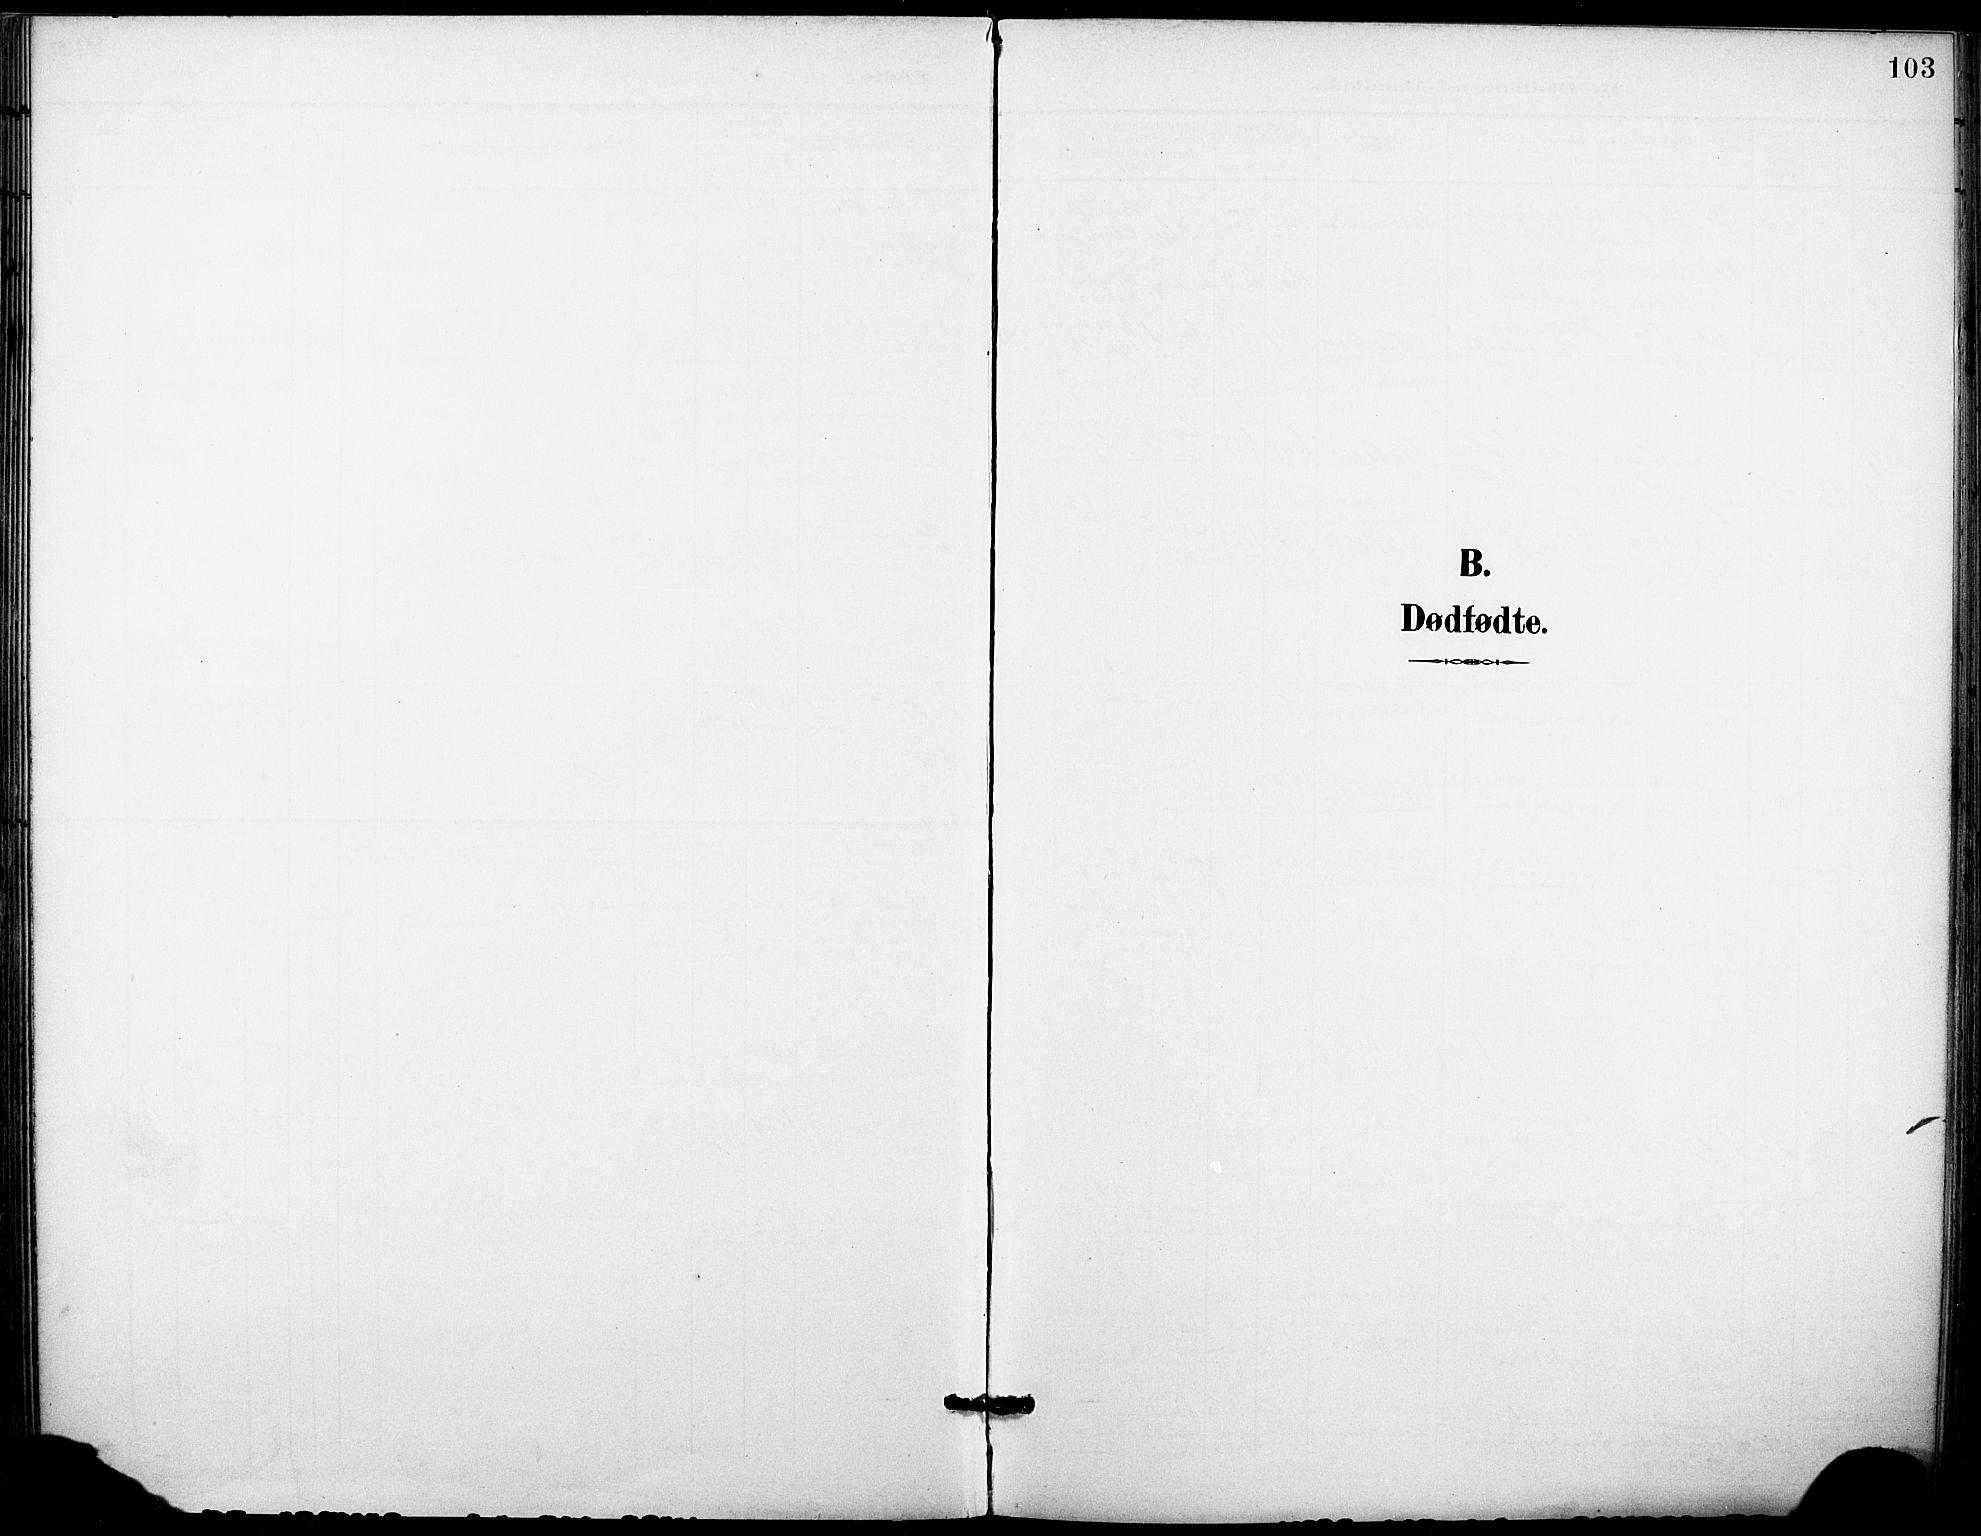 SAKO, Holla kirkebøker, F/Fa/L0010: Ministerialbok nr. 10, 1897-1907, s. 103